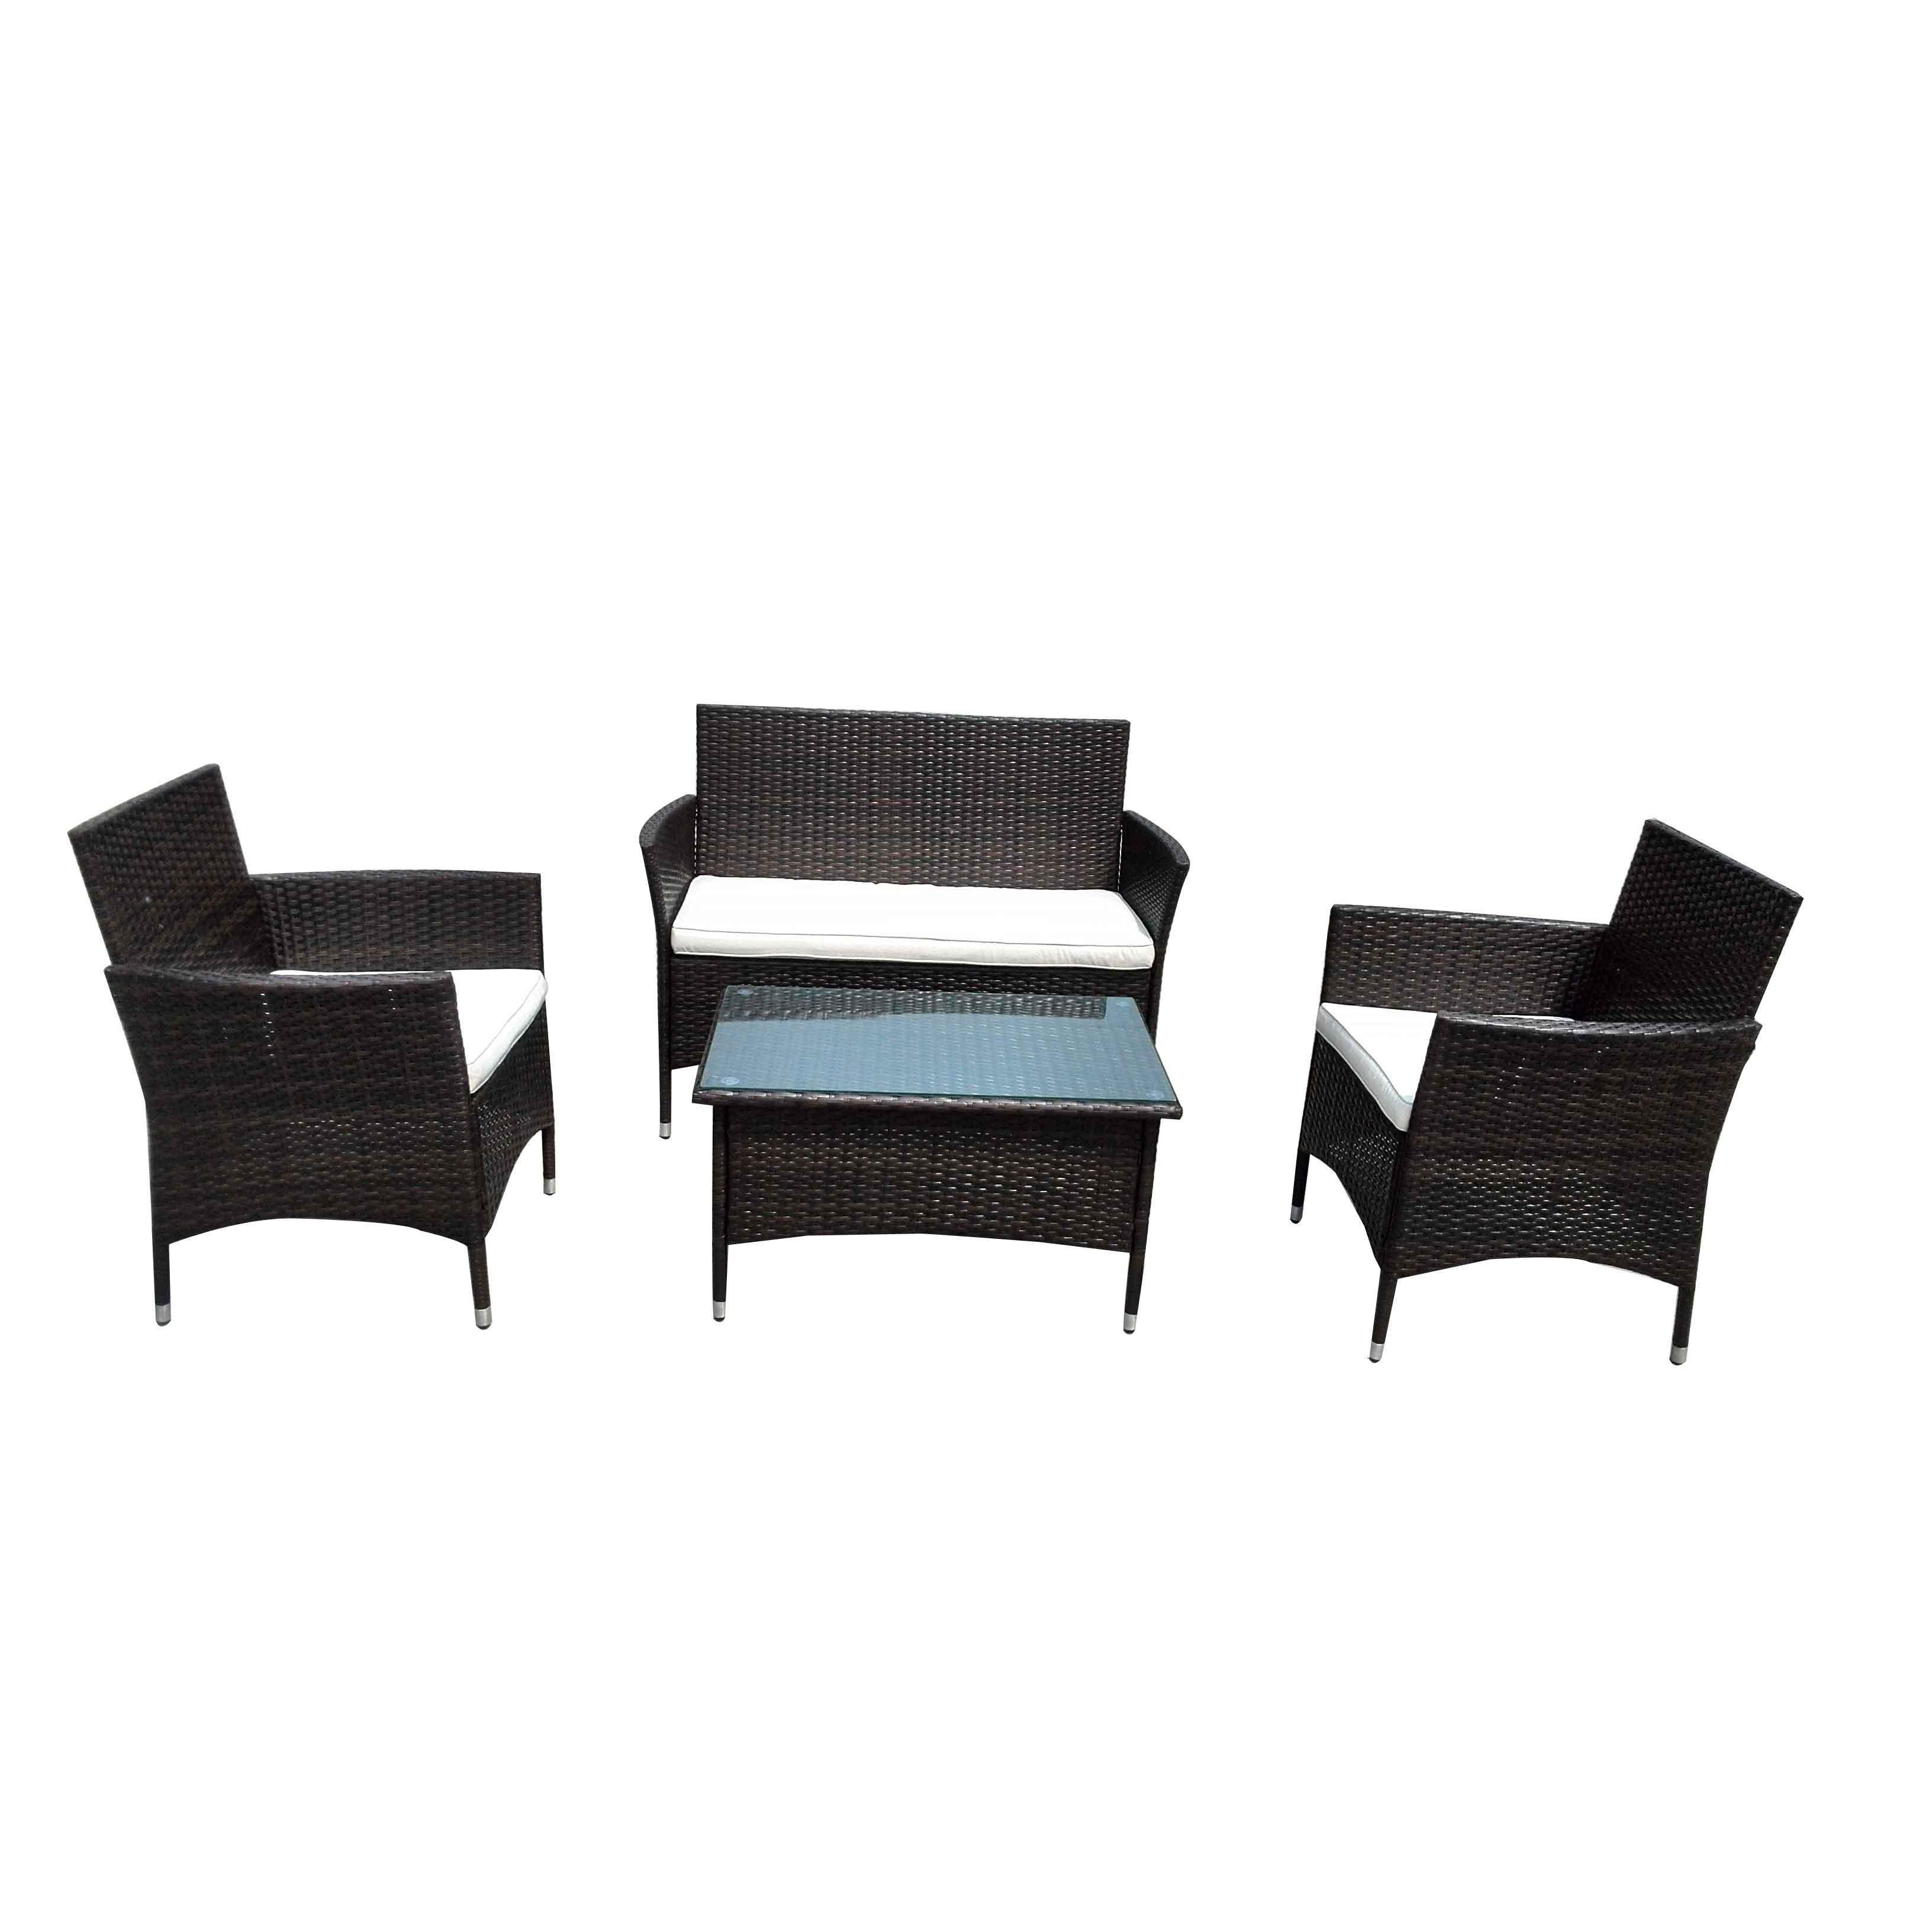 OEM China Pavilion Gazebo Pe - JJ3147 Steel frame rattan 4pcs sofa set – Jin-jiang Industry